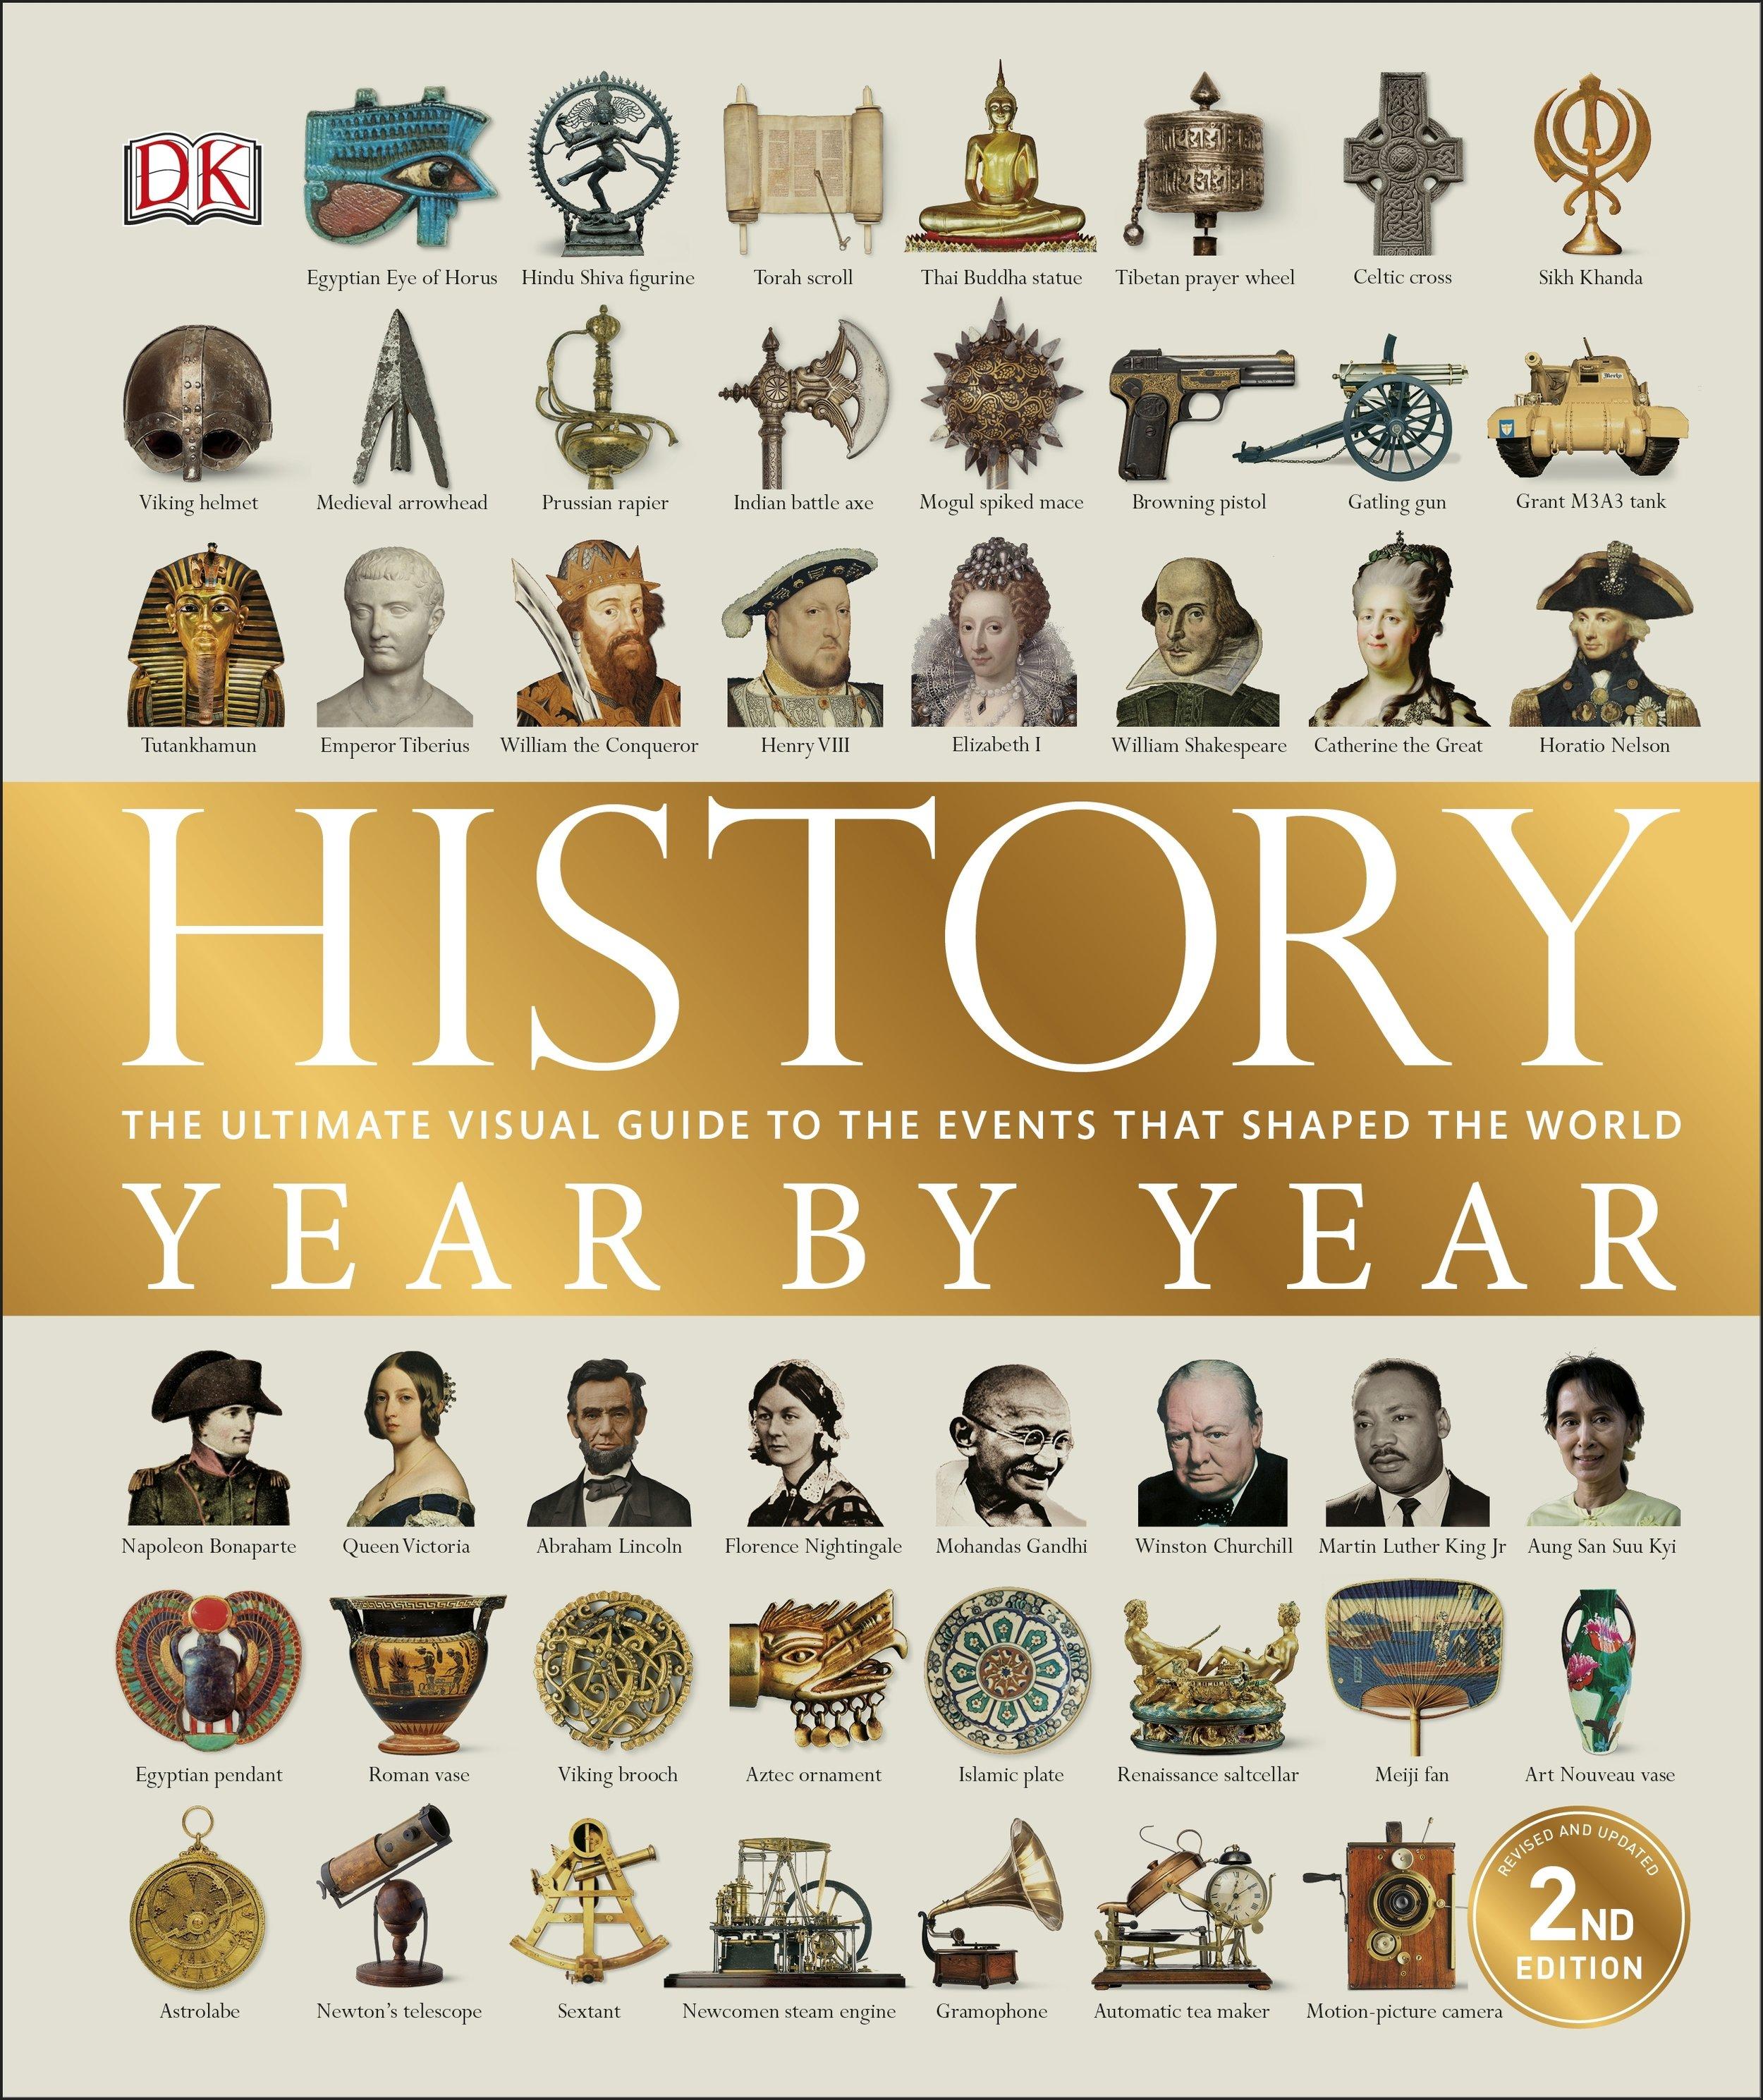 Books DK Eyewitness History Year By Year.jpg